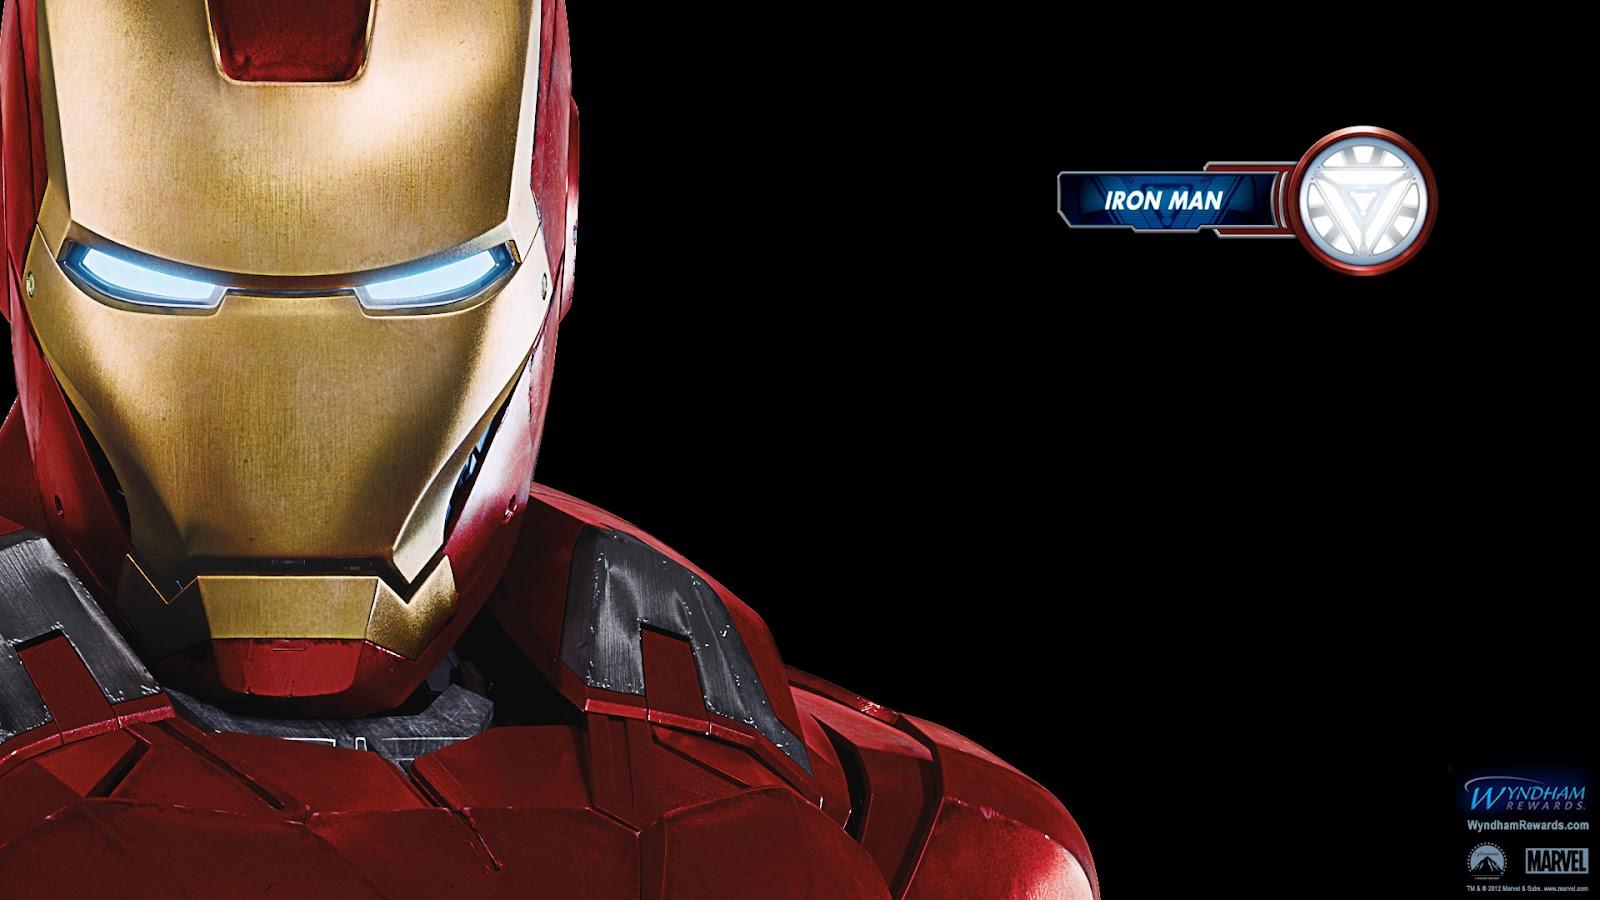 http://1.bp.blogspot.com/-agqC-WA9HpE/T4SjIEBLhhI/AAAAAAAAAd8/Nk53bDZGYak/s1600/the-avengers-wallpaper-iron-man.jpg